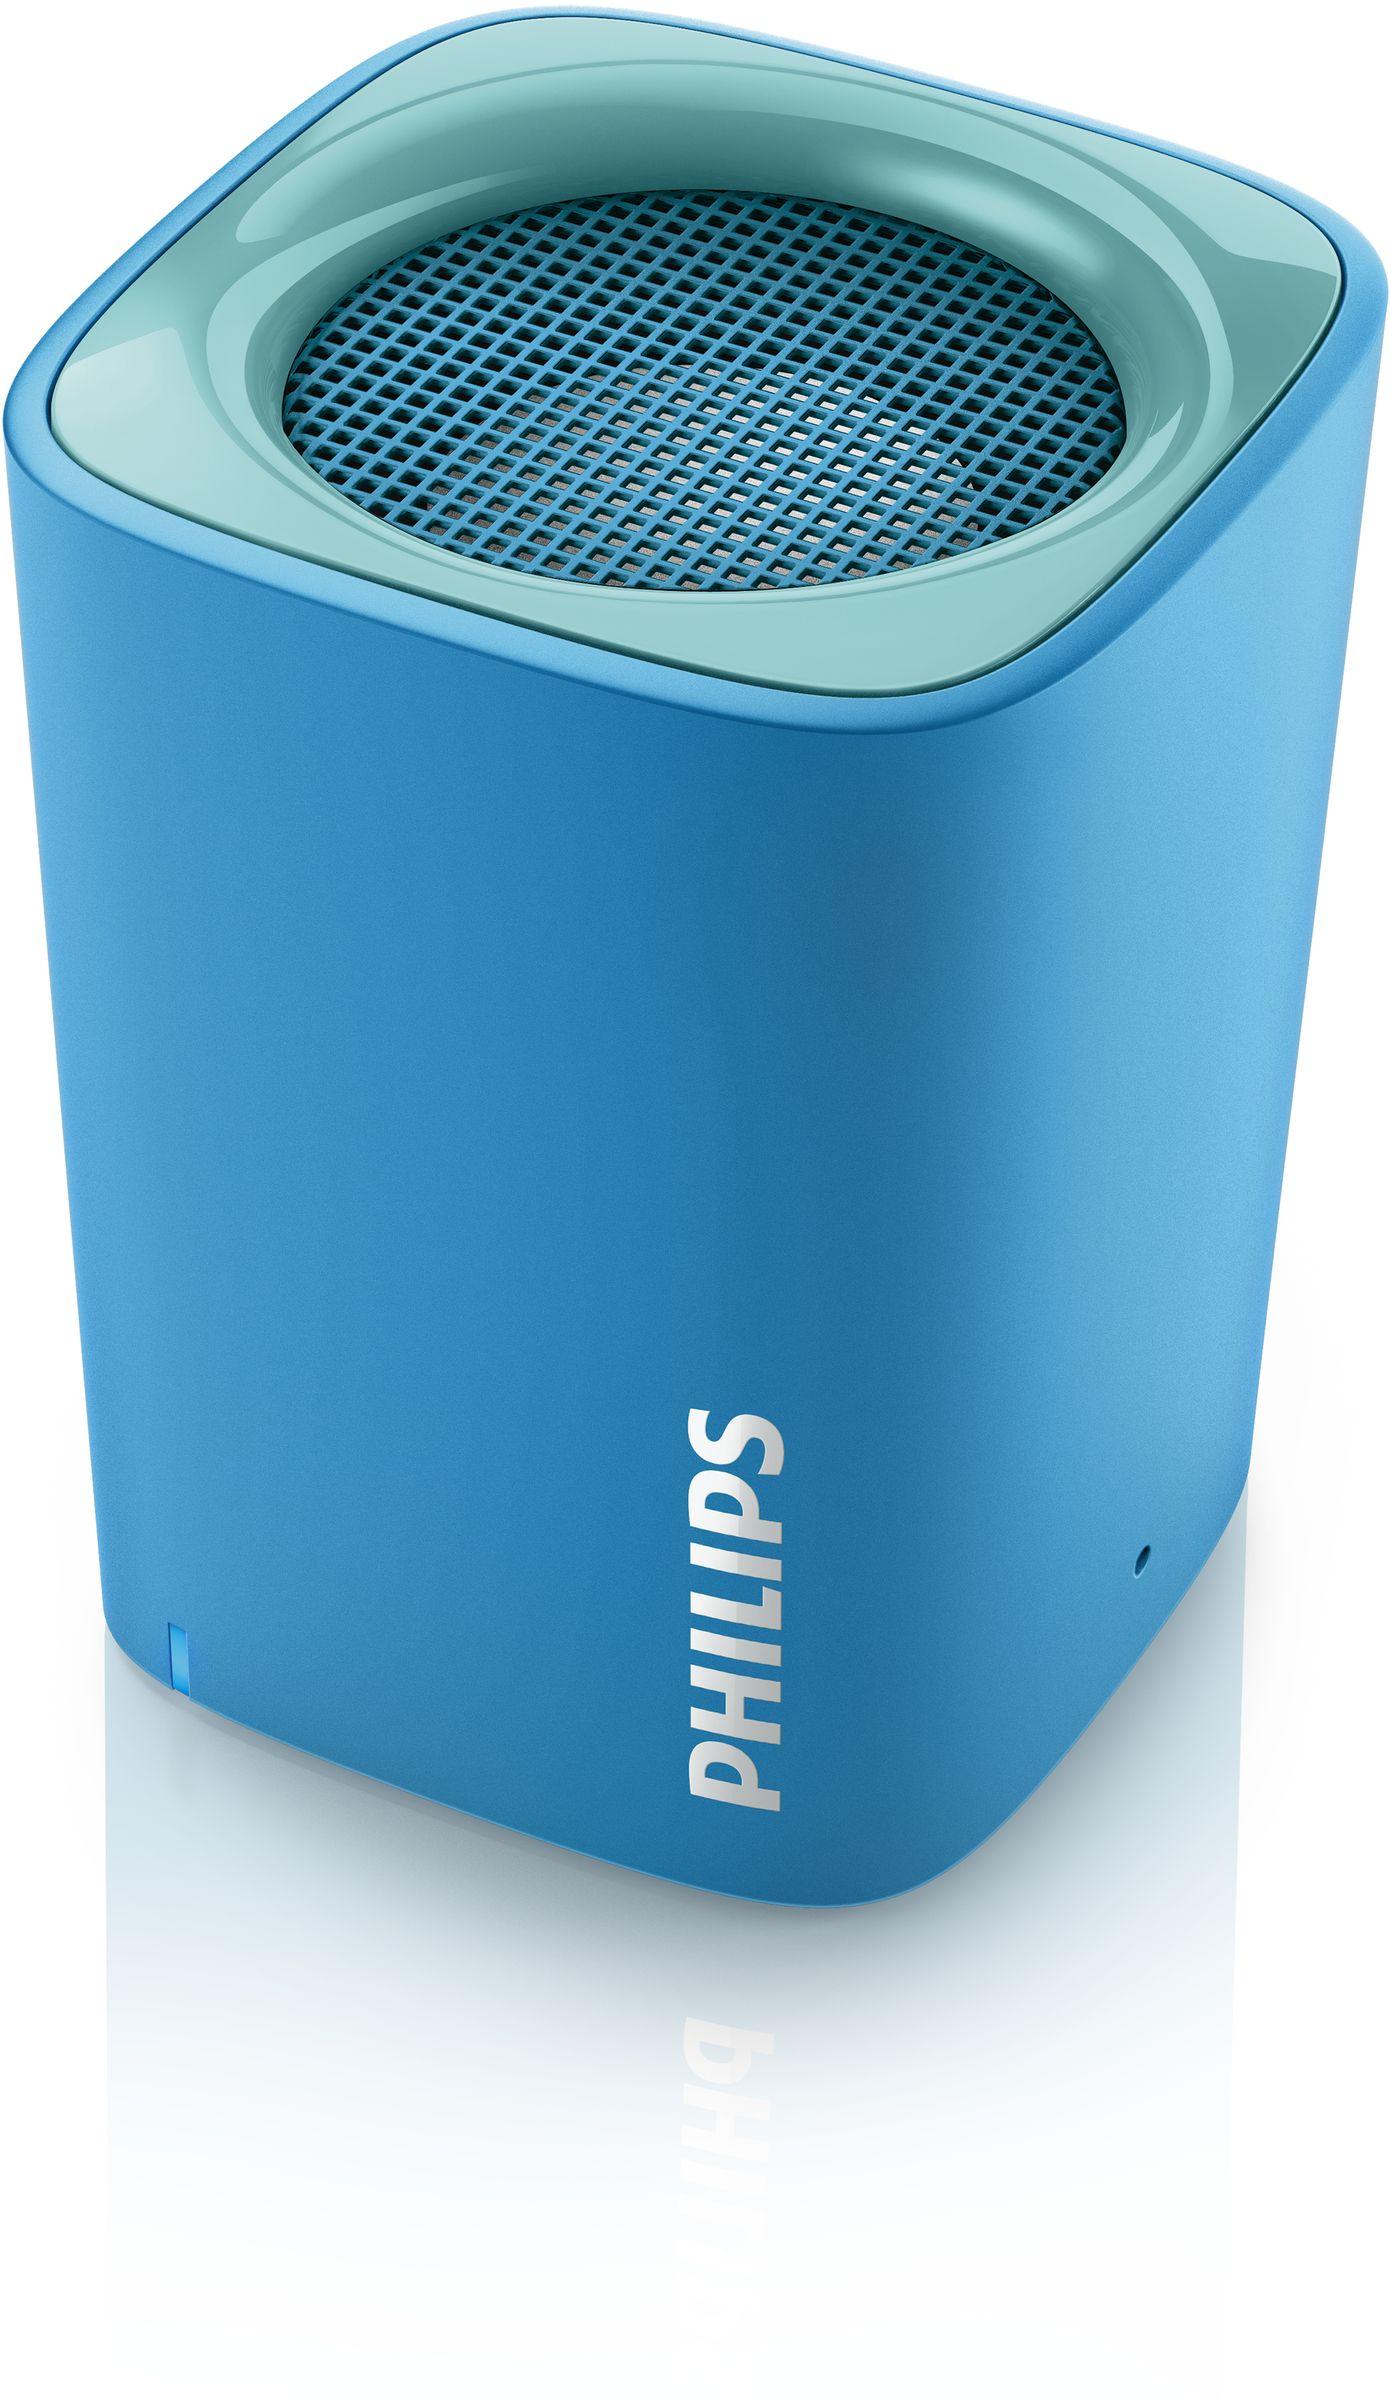 Philips altoparlante wireless portatile bt100a 00 for Cassa bluetooth philips